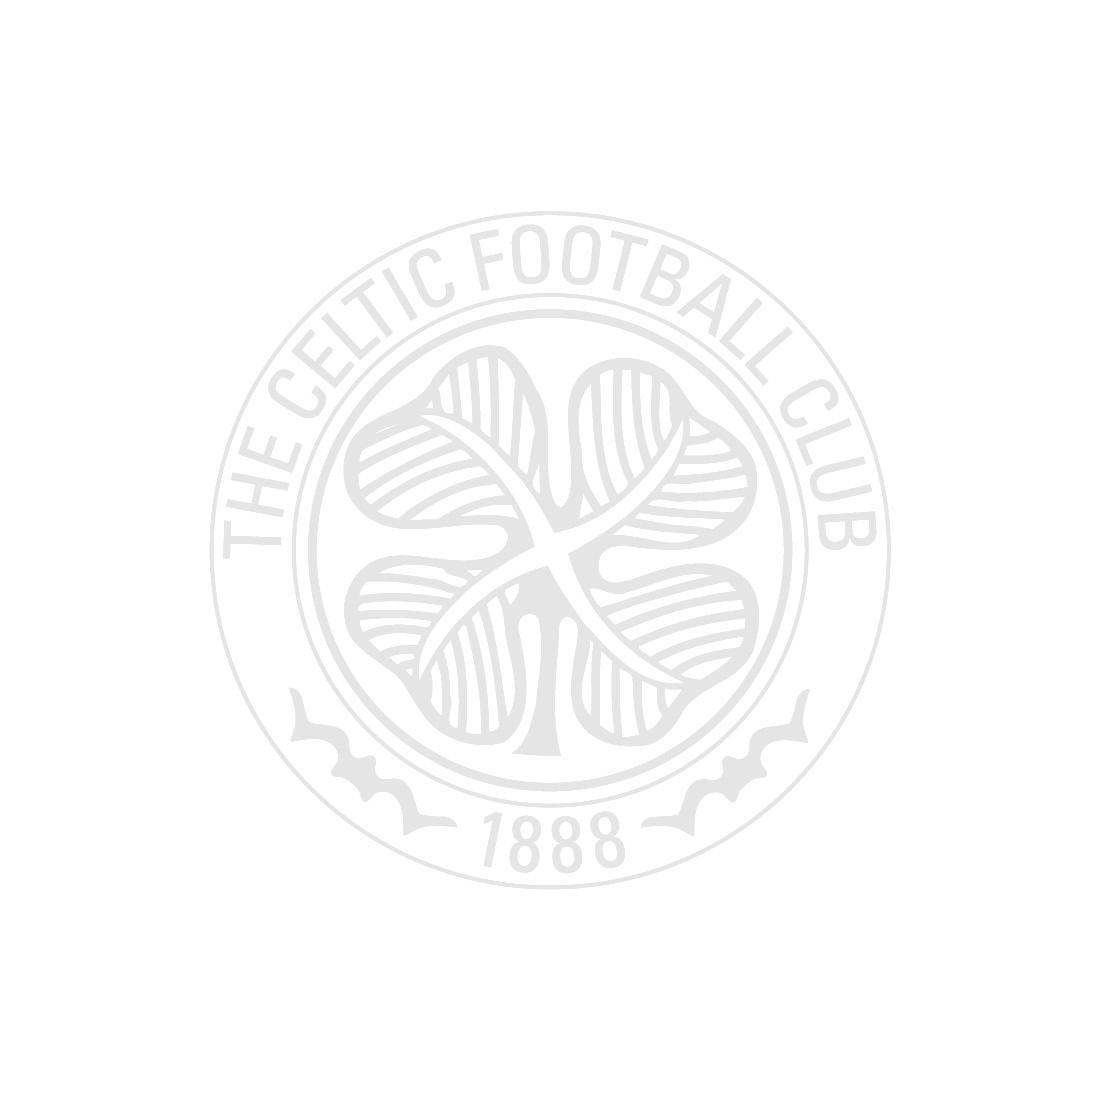 Celtic Kieran Tierney Mug with Signature